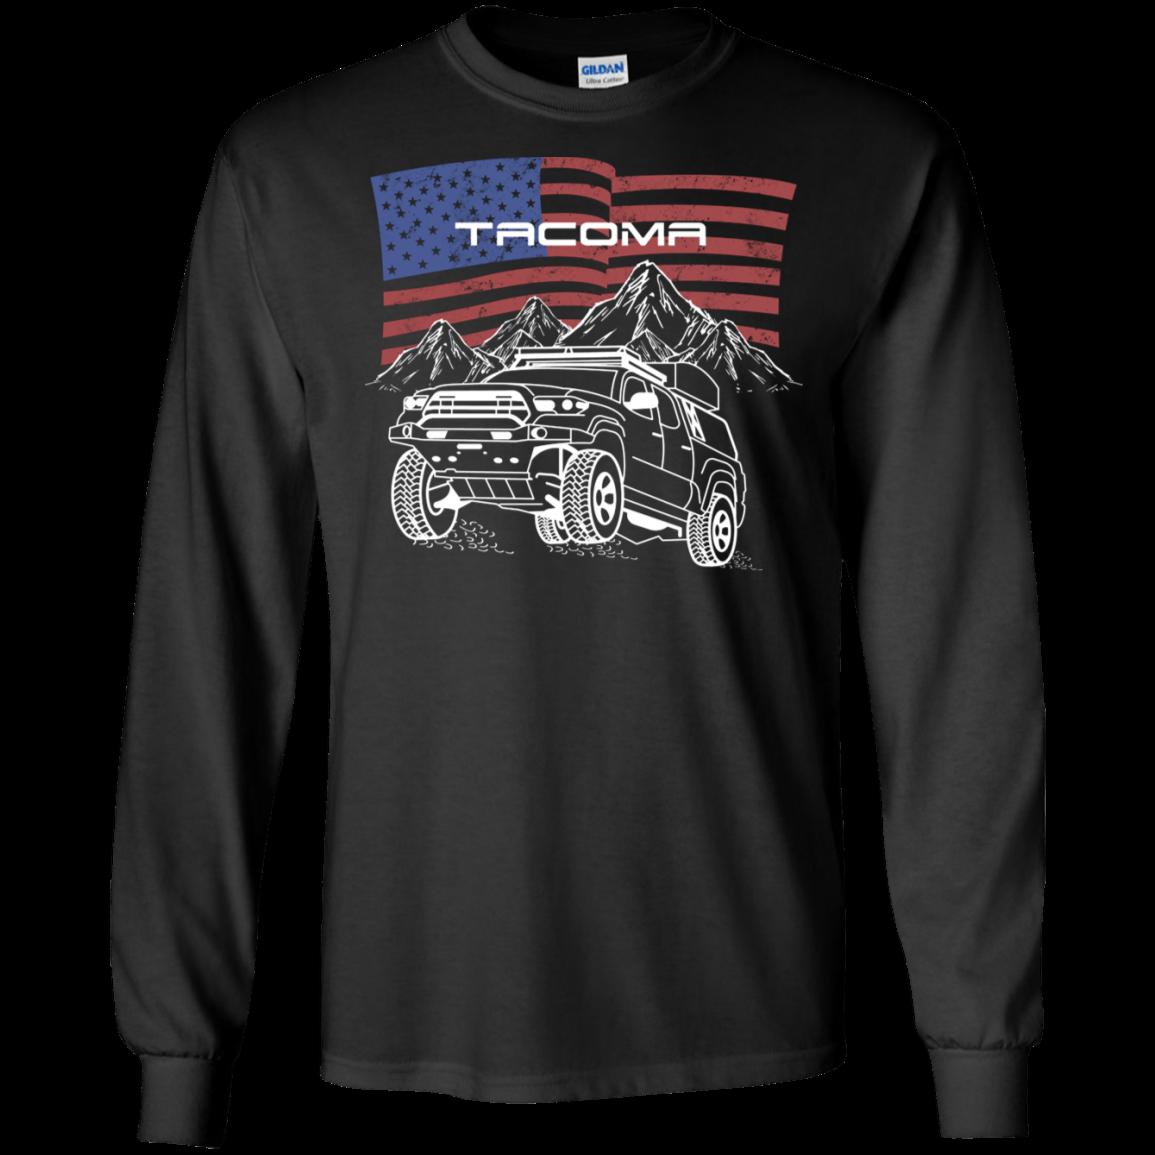 Bodylined Chevrolet Silverado Double Cab Offroad Premium Driving Apparel Icon T-Shirt